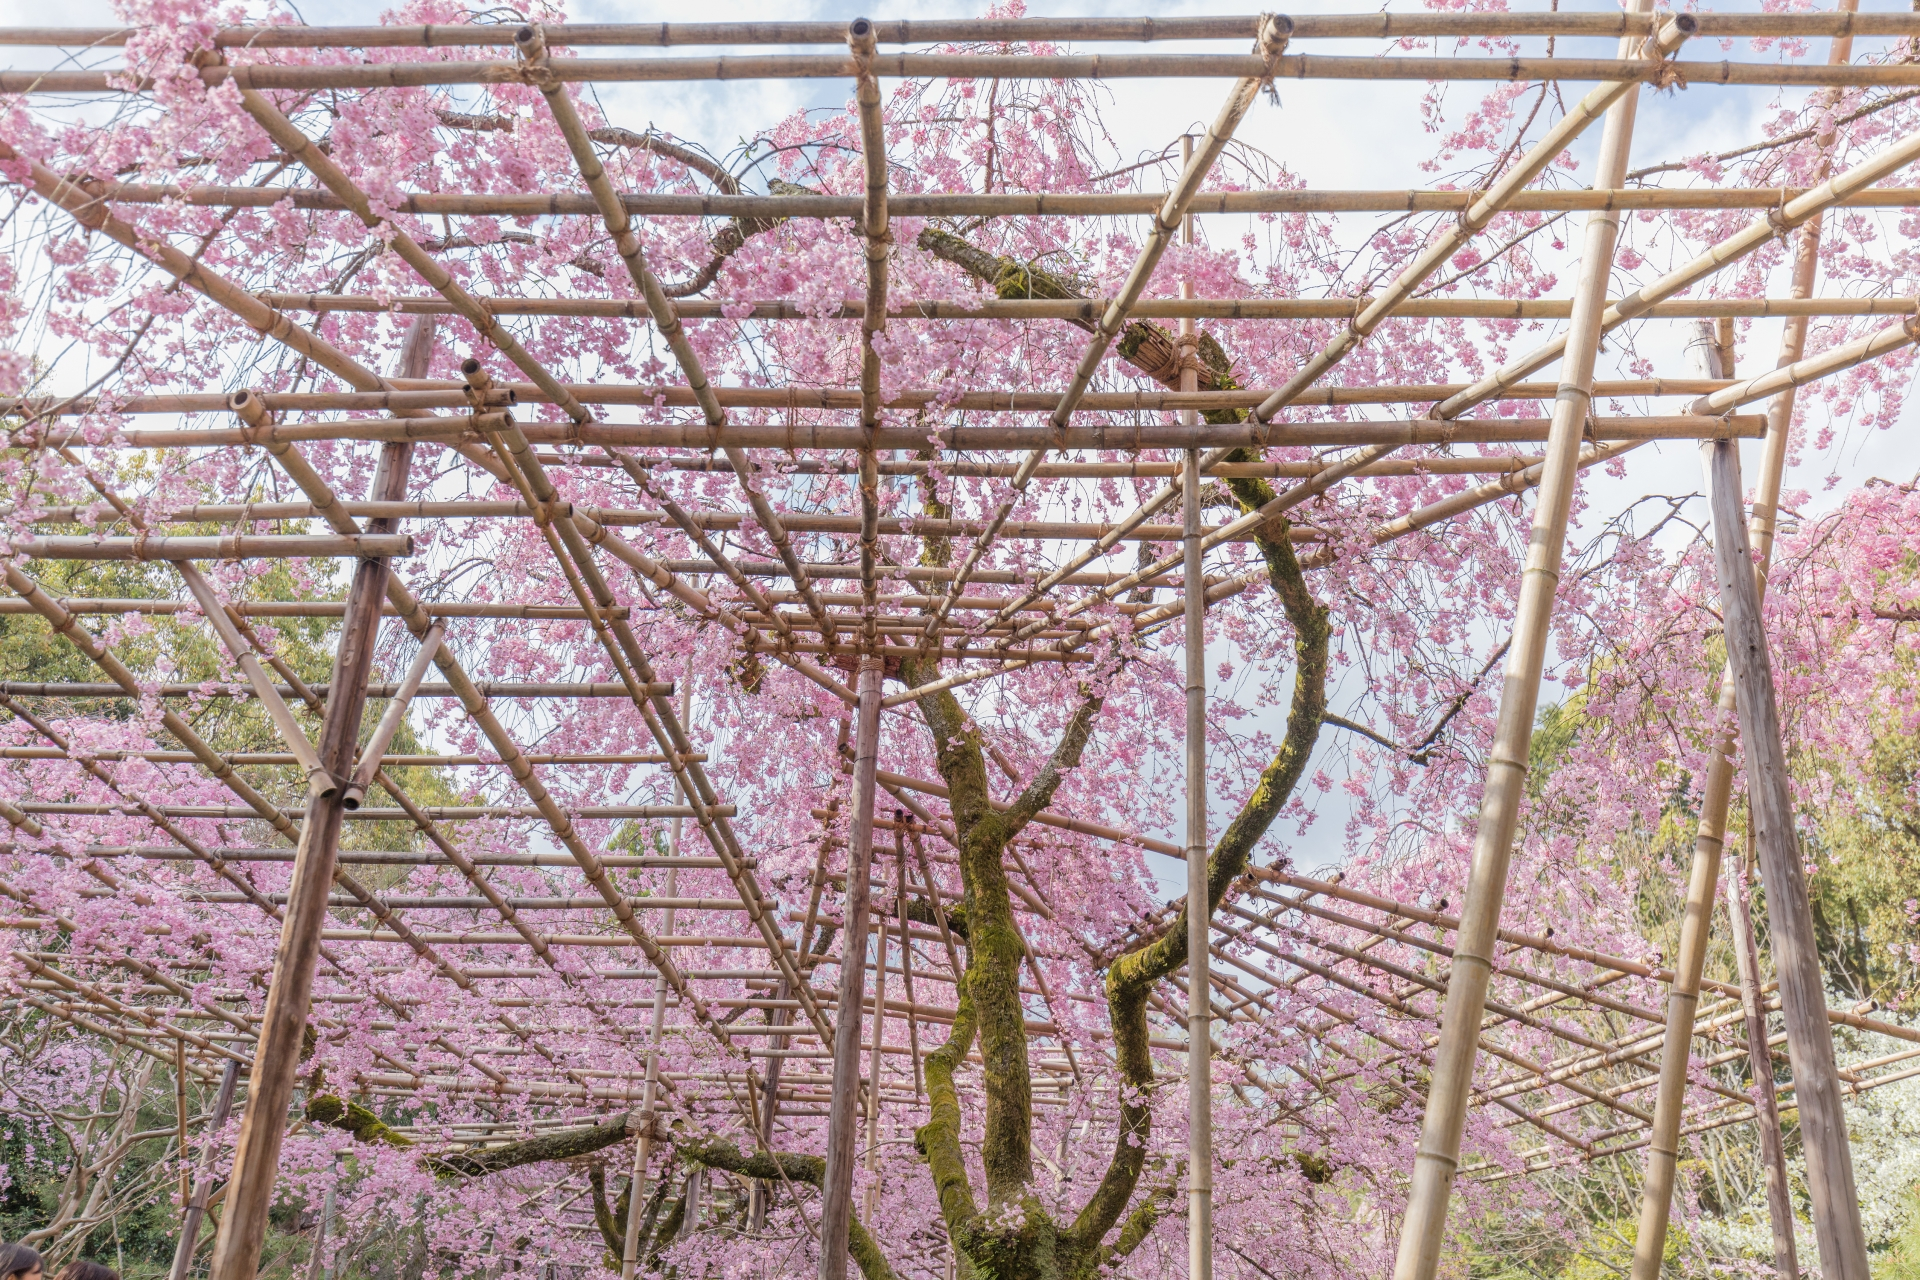 3963403_m 京都府 平安神宮(水面に映る桜の景色が美しい春におすすめ桜写真スポット! 撮影した写真の紹介、アクセス情報など)